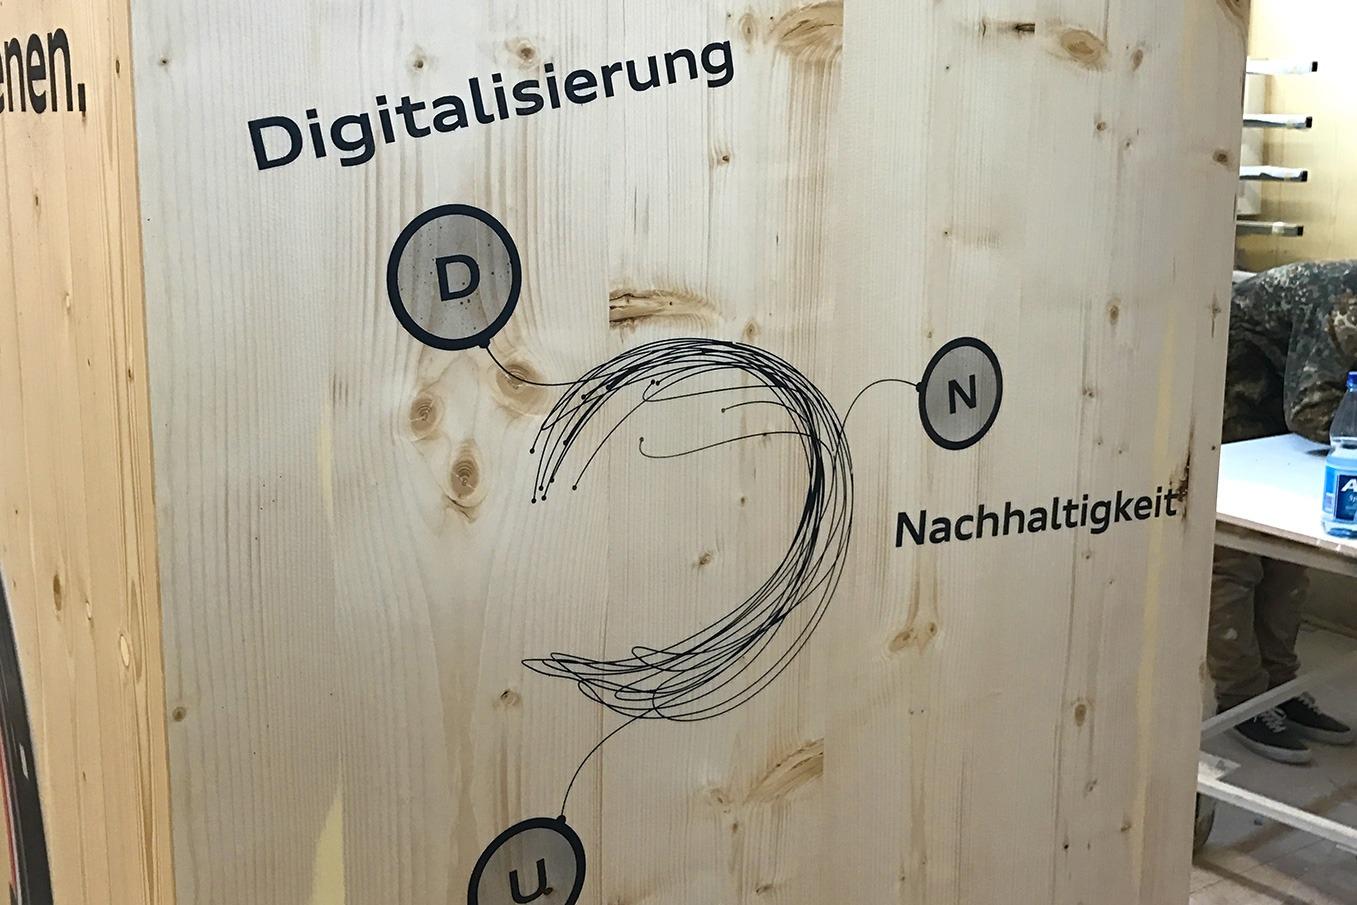 graffitiauftrag-graffitikuenstler-artmos4-audi_2017_schrift_kabel_schwarz_rot_fotorealistisch_folie_objekt